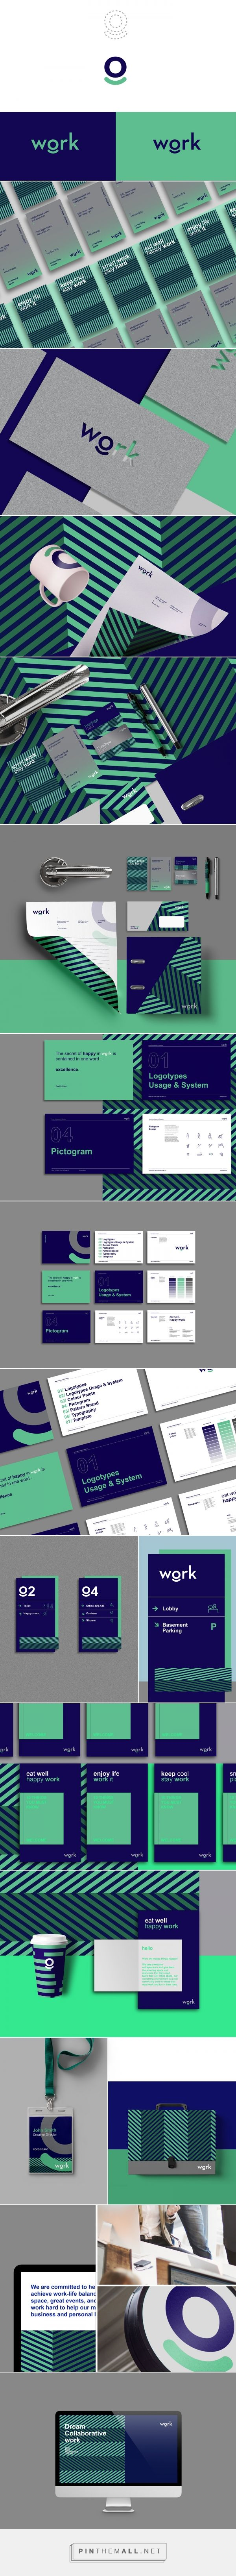 Work - Branding on Behance - created via https://pinthemall.net